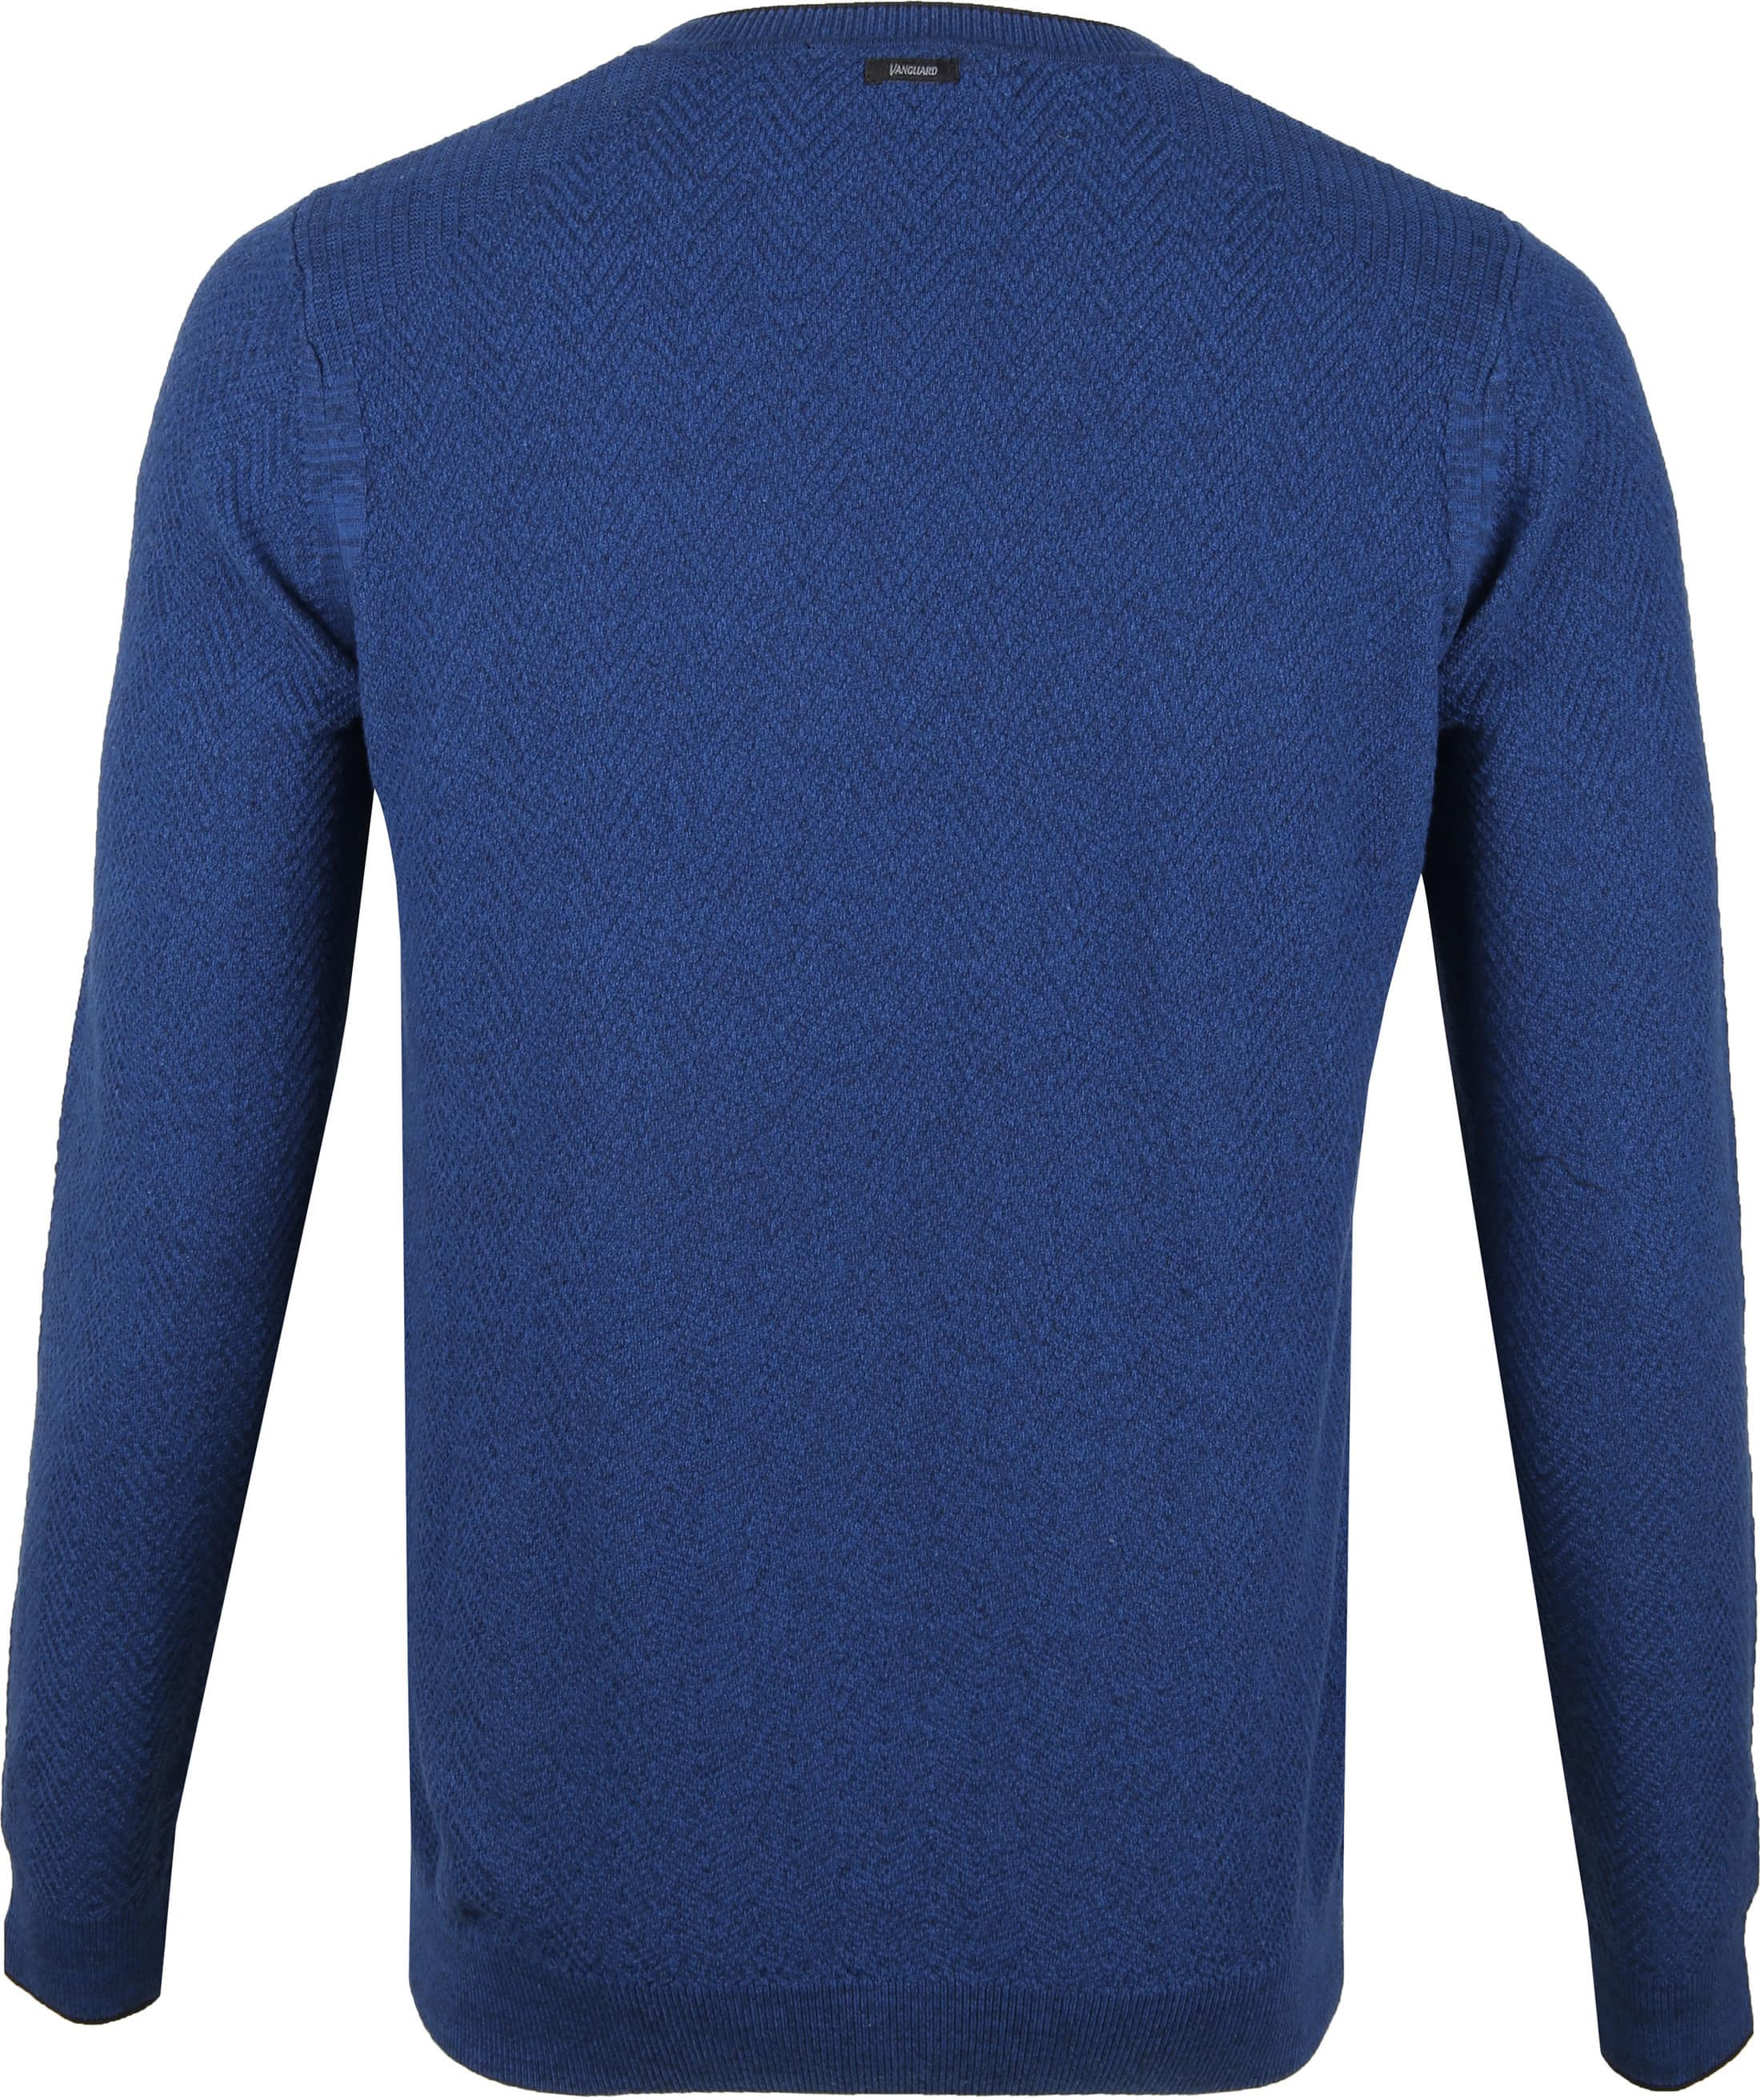 Vanguard Pullover Blauw foto 3